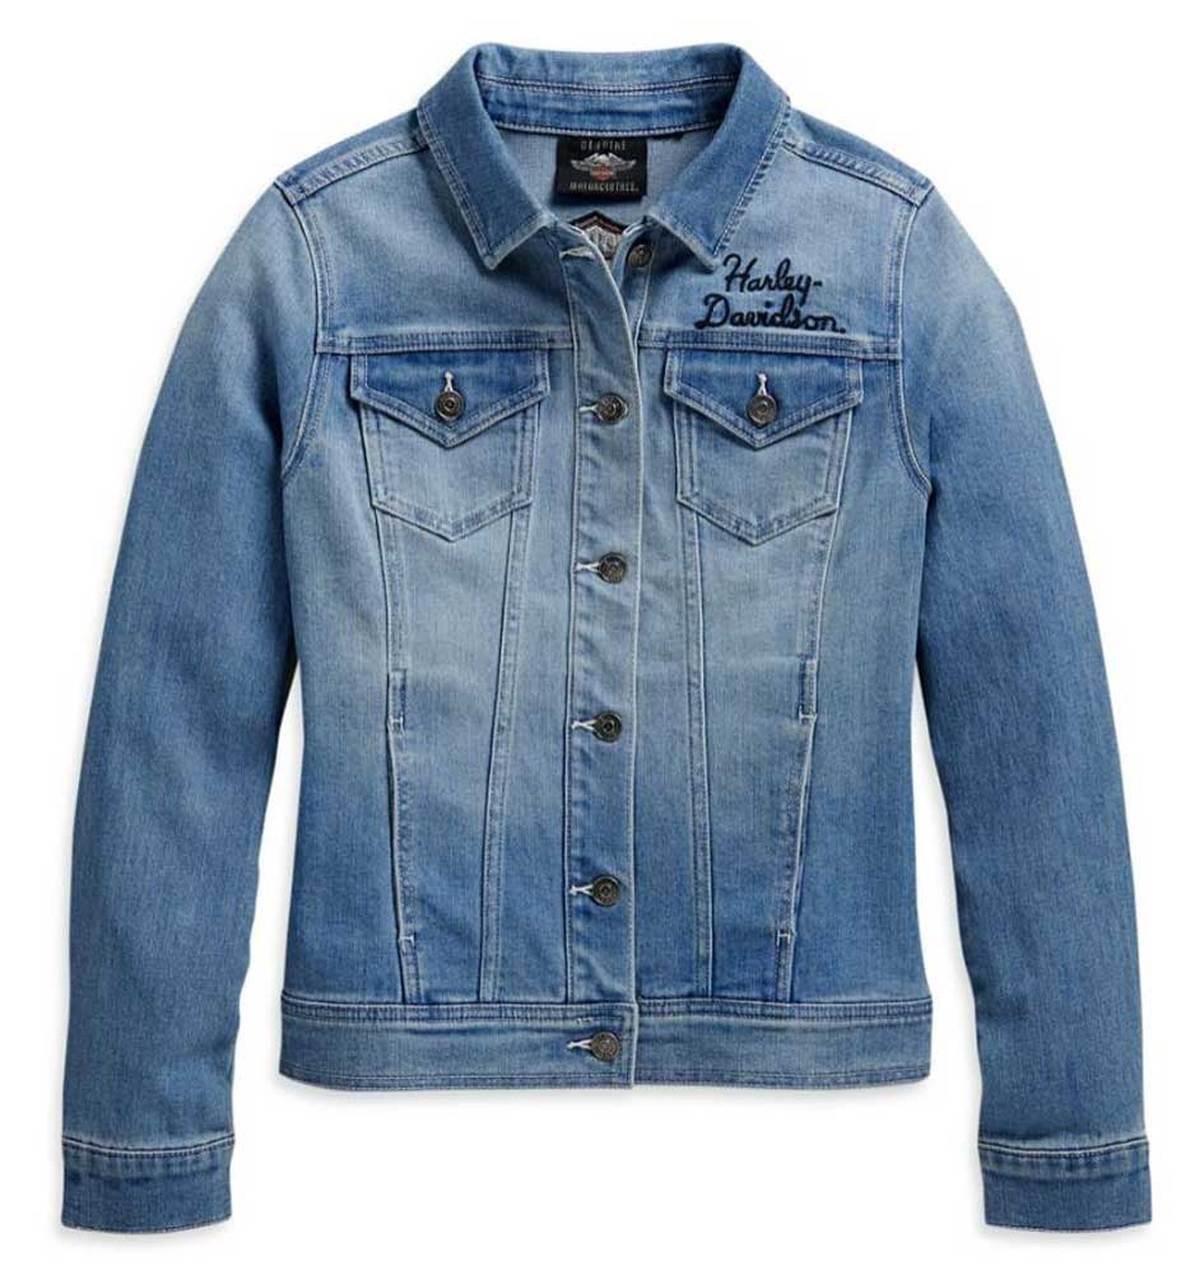 Harley-Davidson® Women's Winged Logo Cotton Blend Denim Jacket, Blue